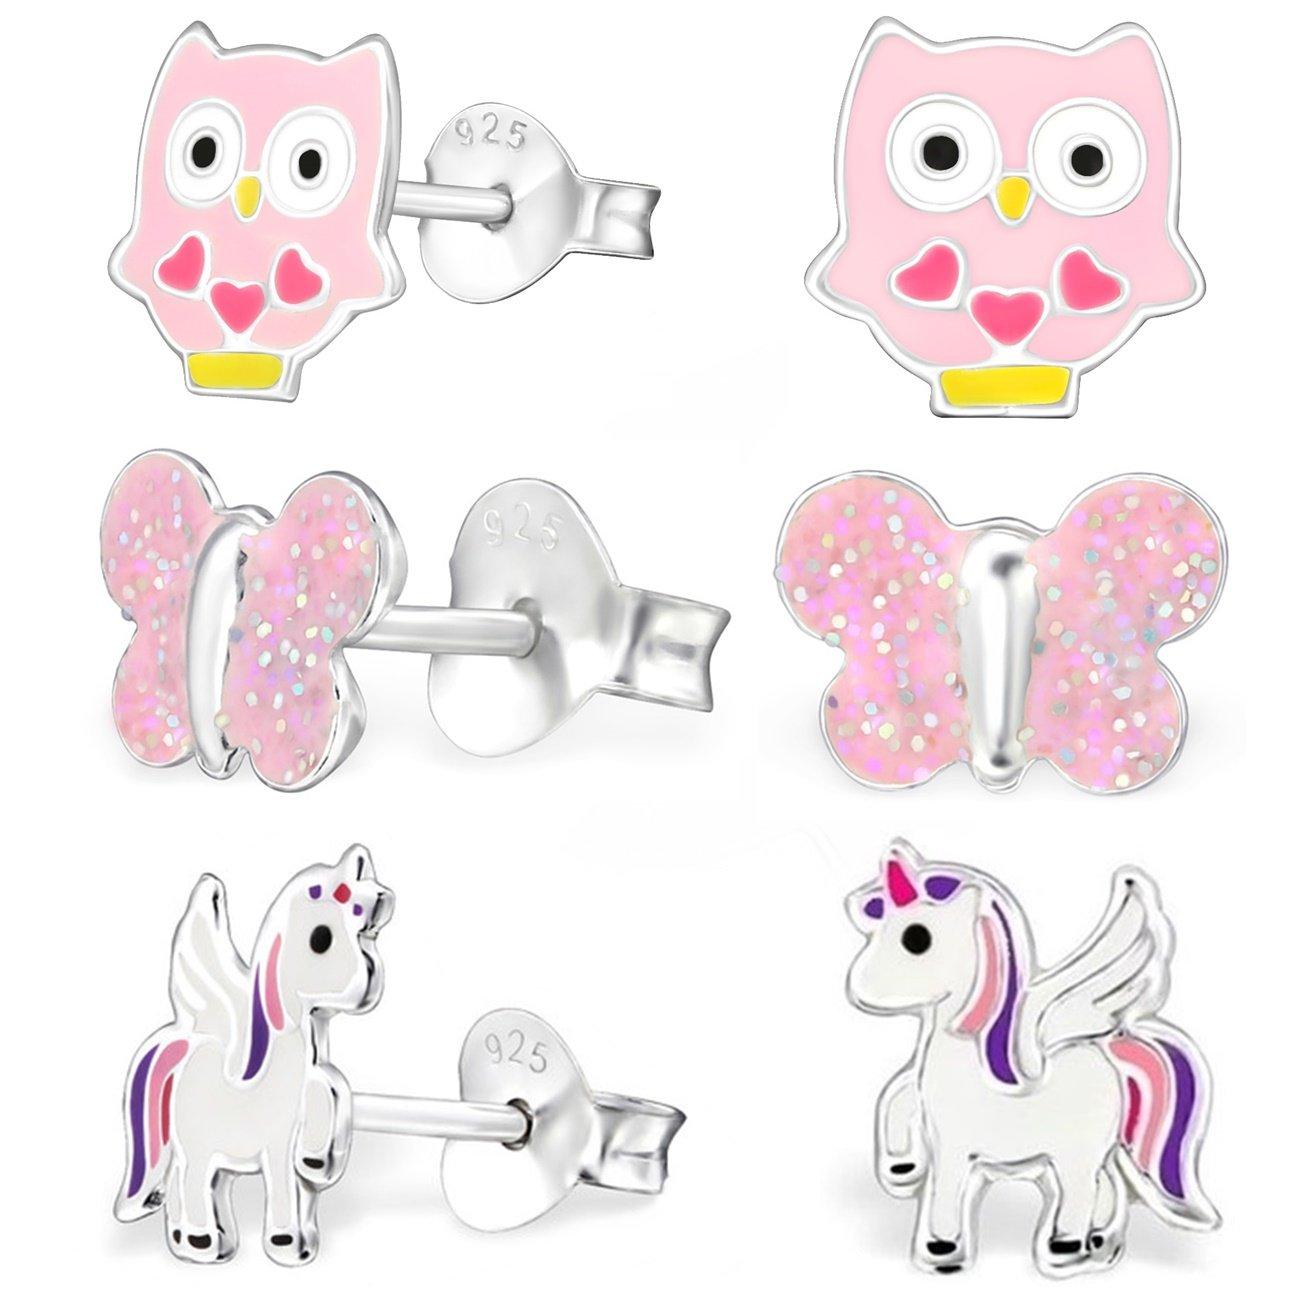 GH* KIDS 3 PAAR Ohrstecker Pegasus Einhorn + Eule + Schmetterling 925 Echt Silber Mädchen Kinder Ohrringe XM107 GH-1a XM007ÄD